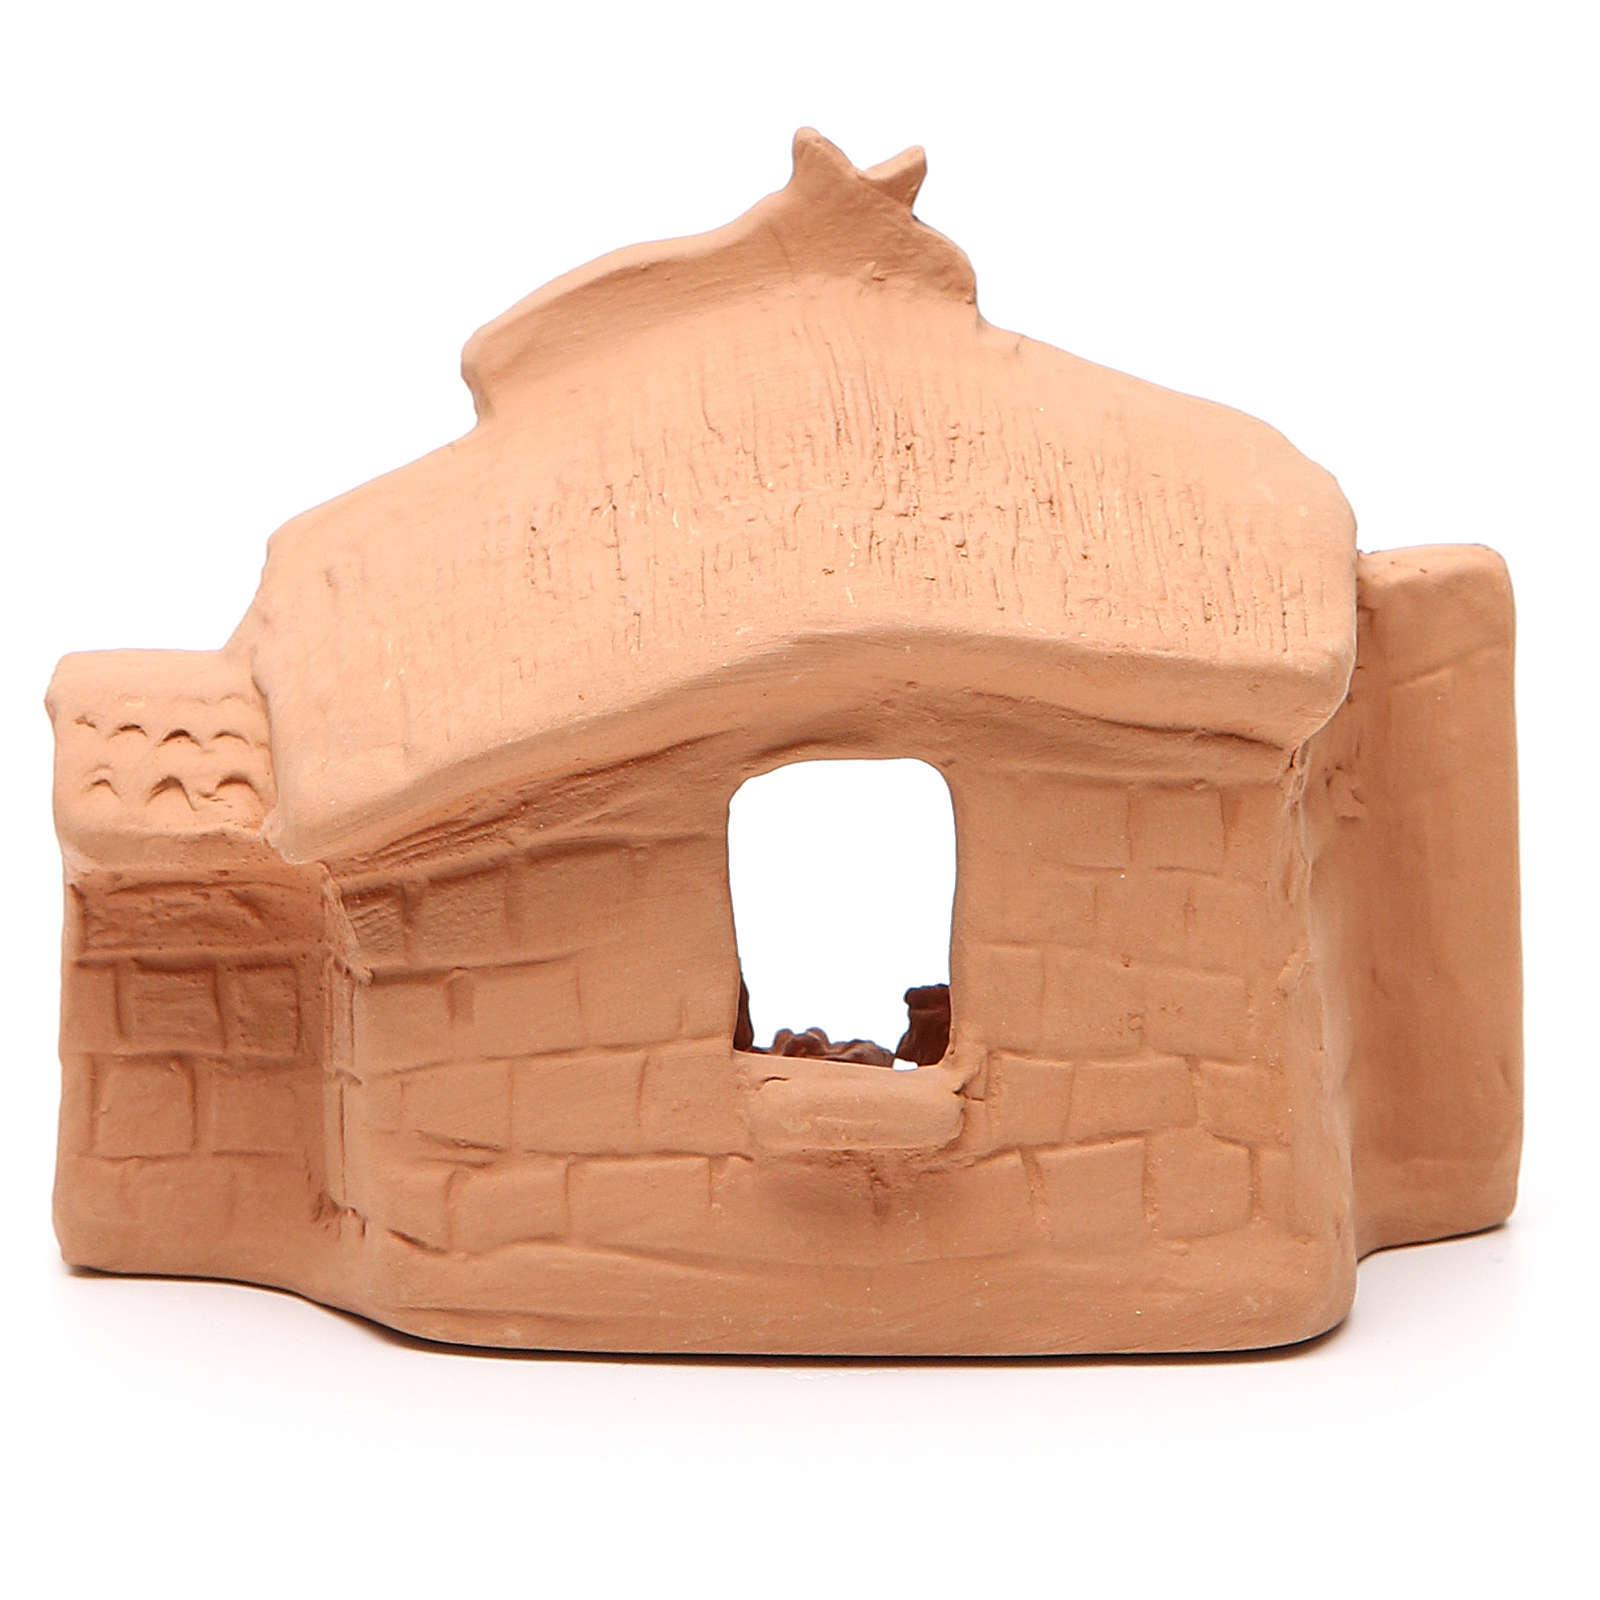 Capanna e natività terracotta naturale 11x14x7 cm 4